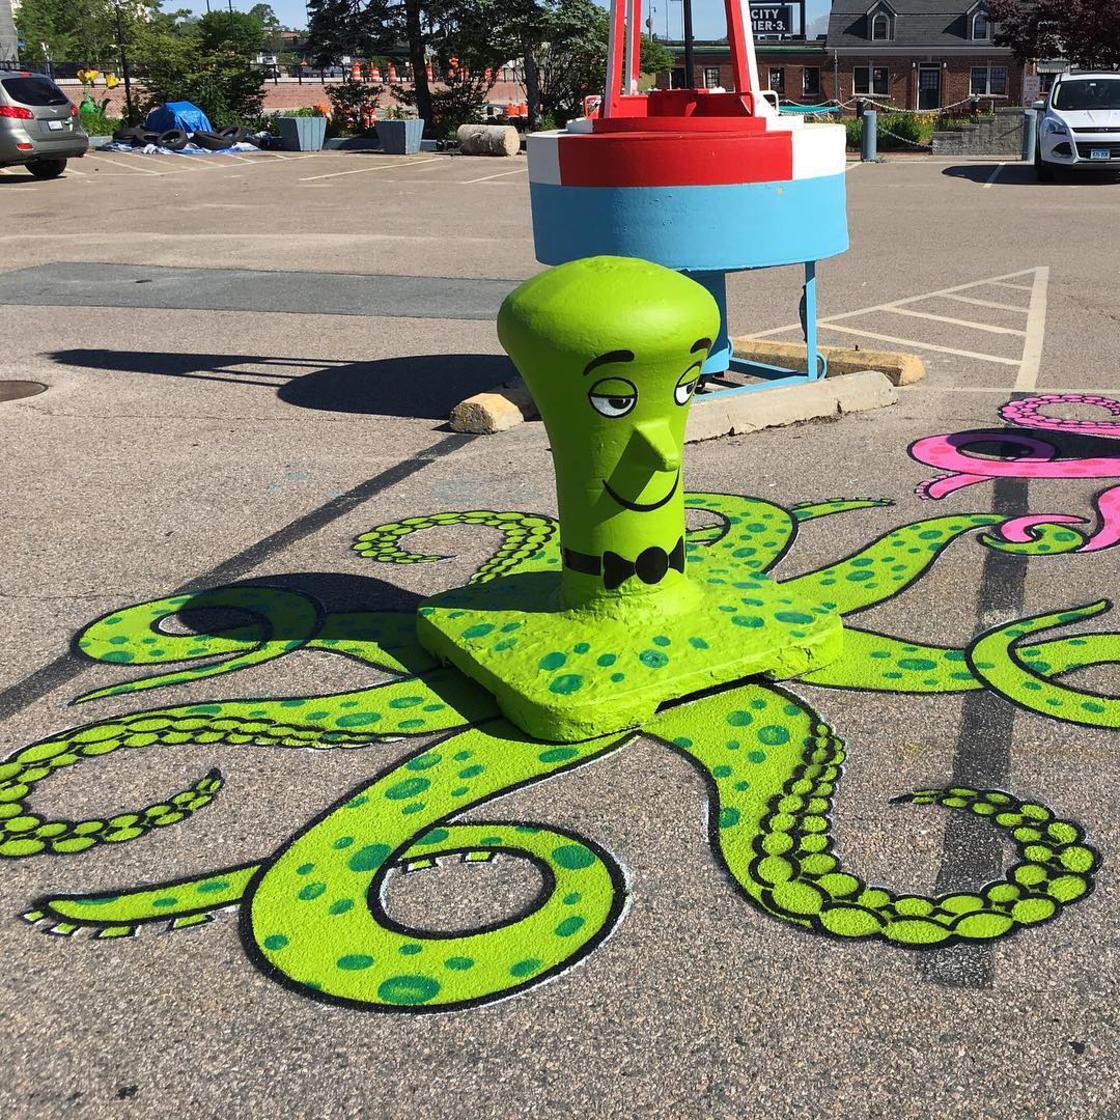 tom-bob-street-art-new-york-13.jpg